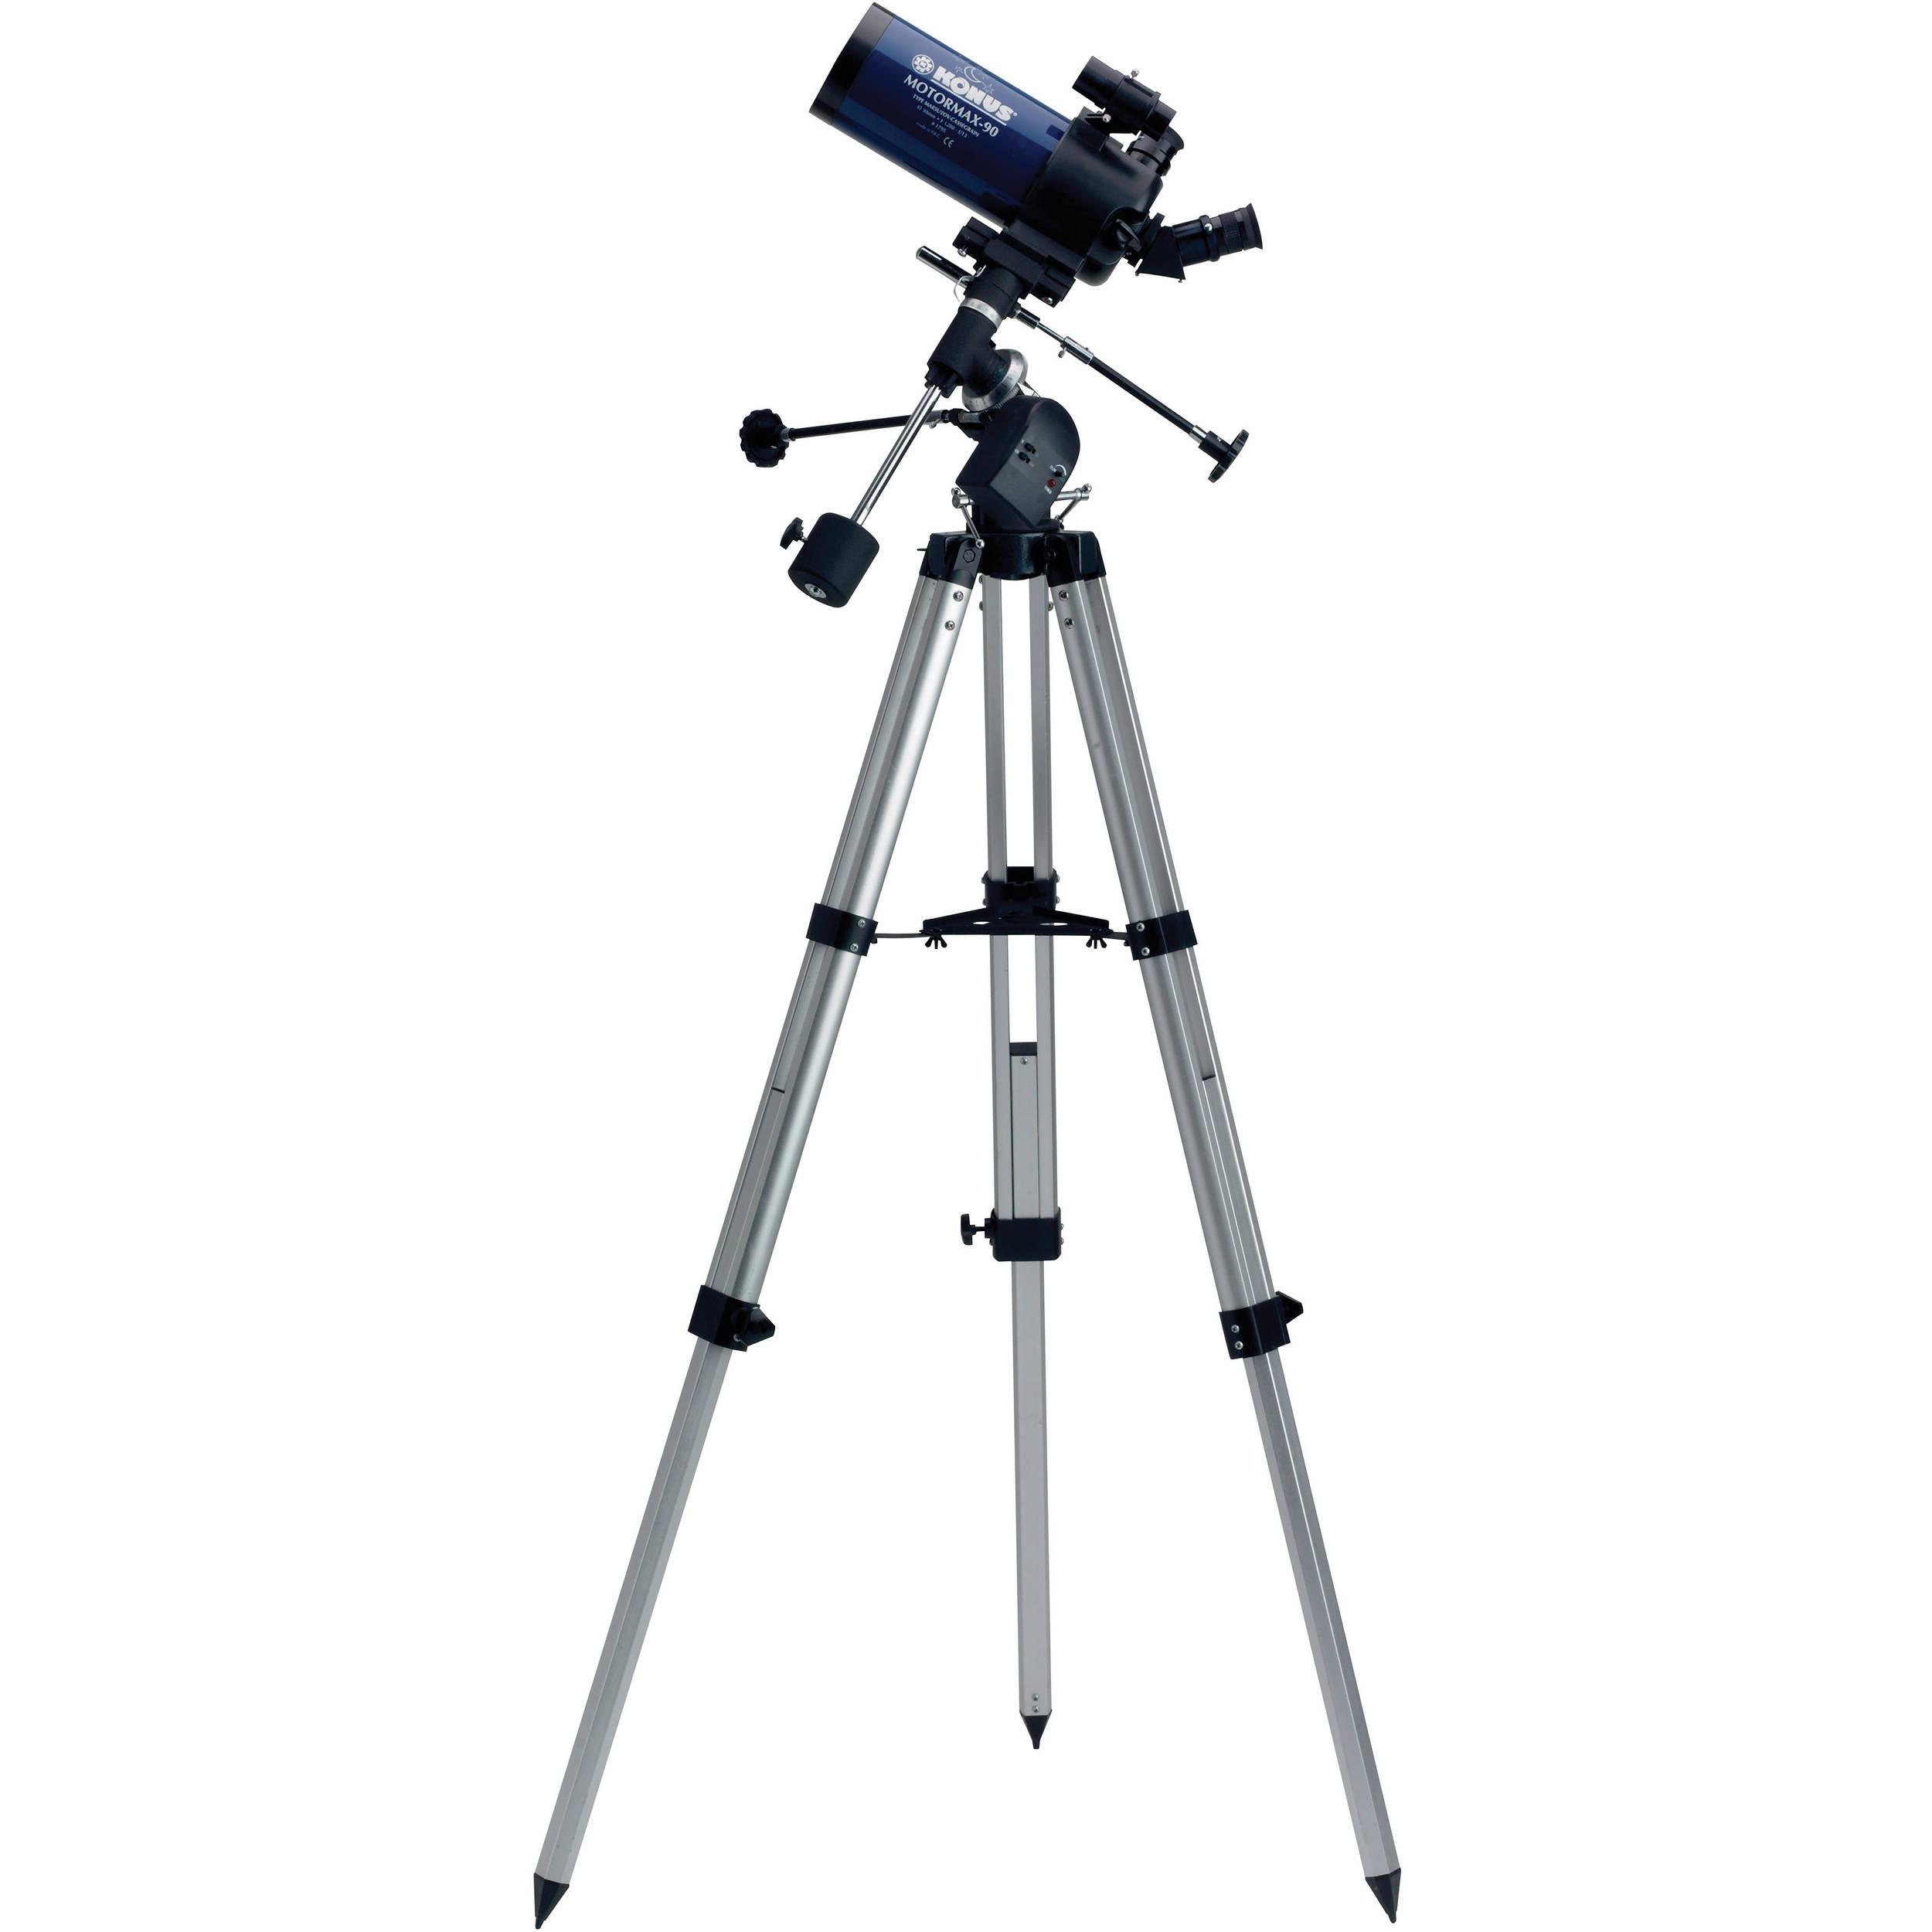 Konus MotorMax-90 90mm f/13 3 Maksutov-Cassegrain Telescope with RA Motor